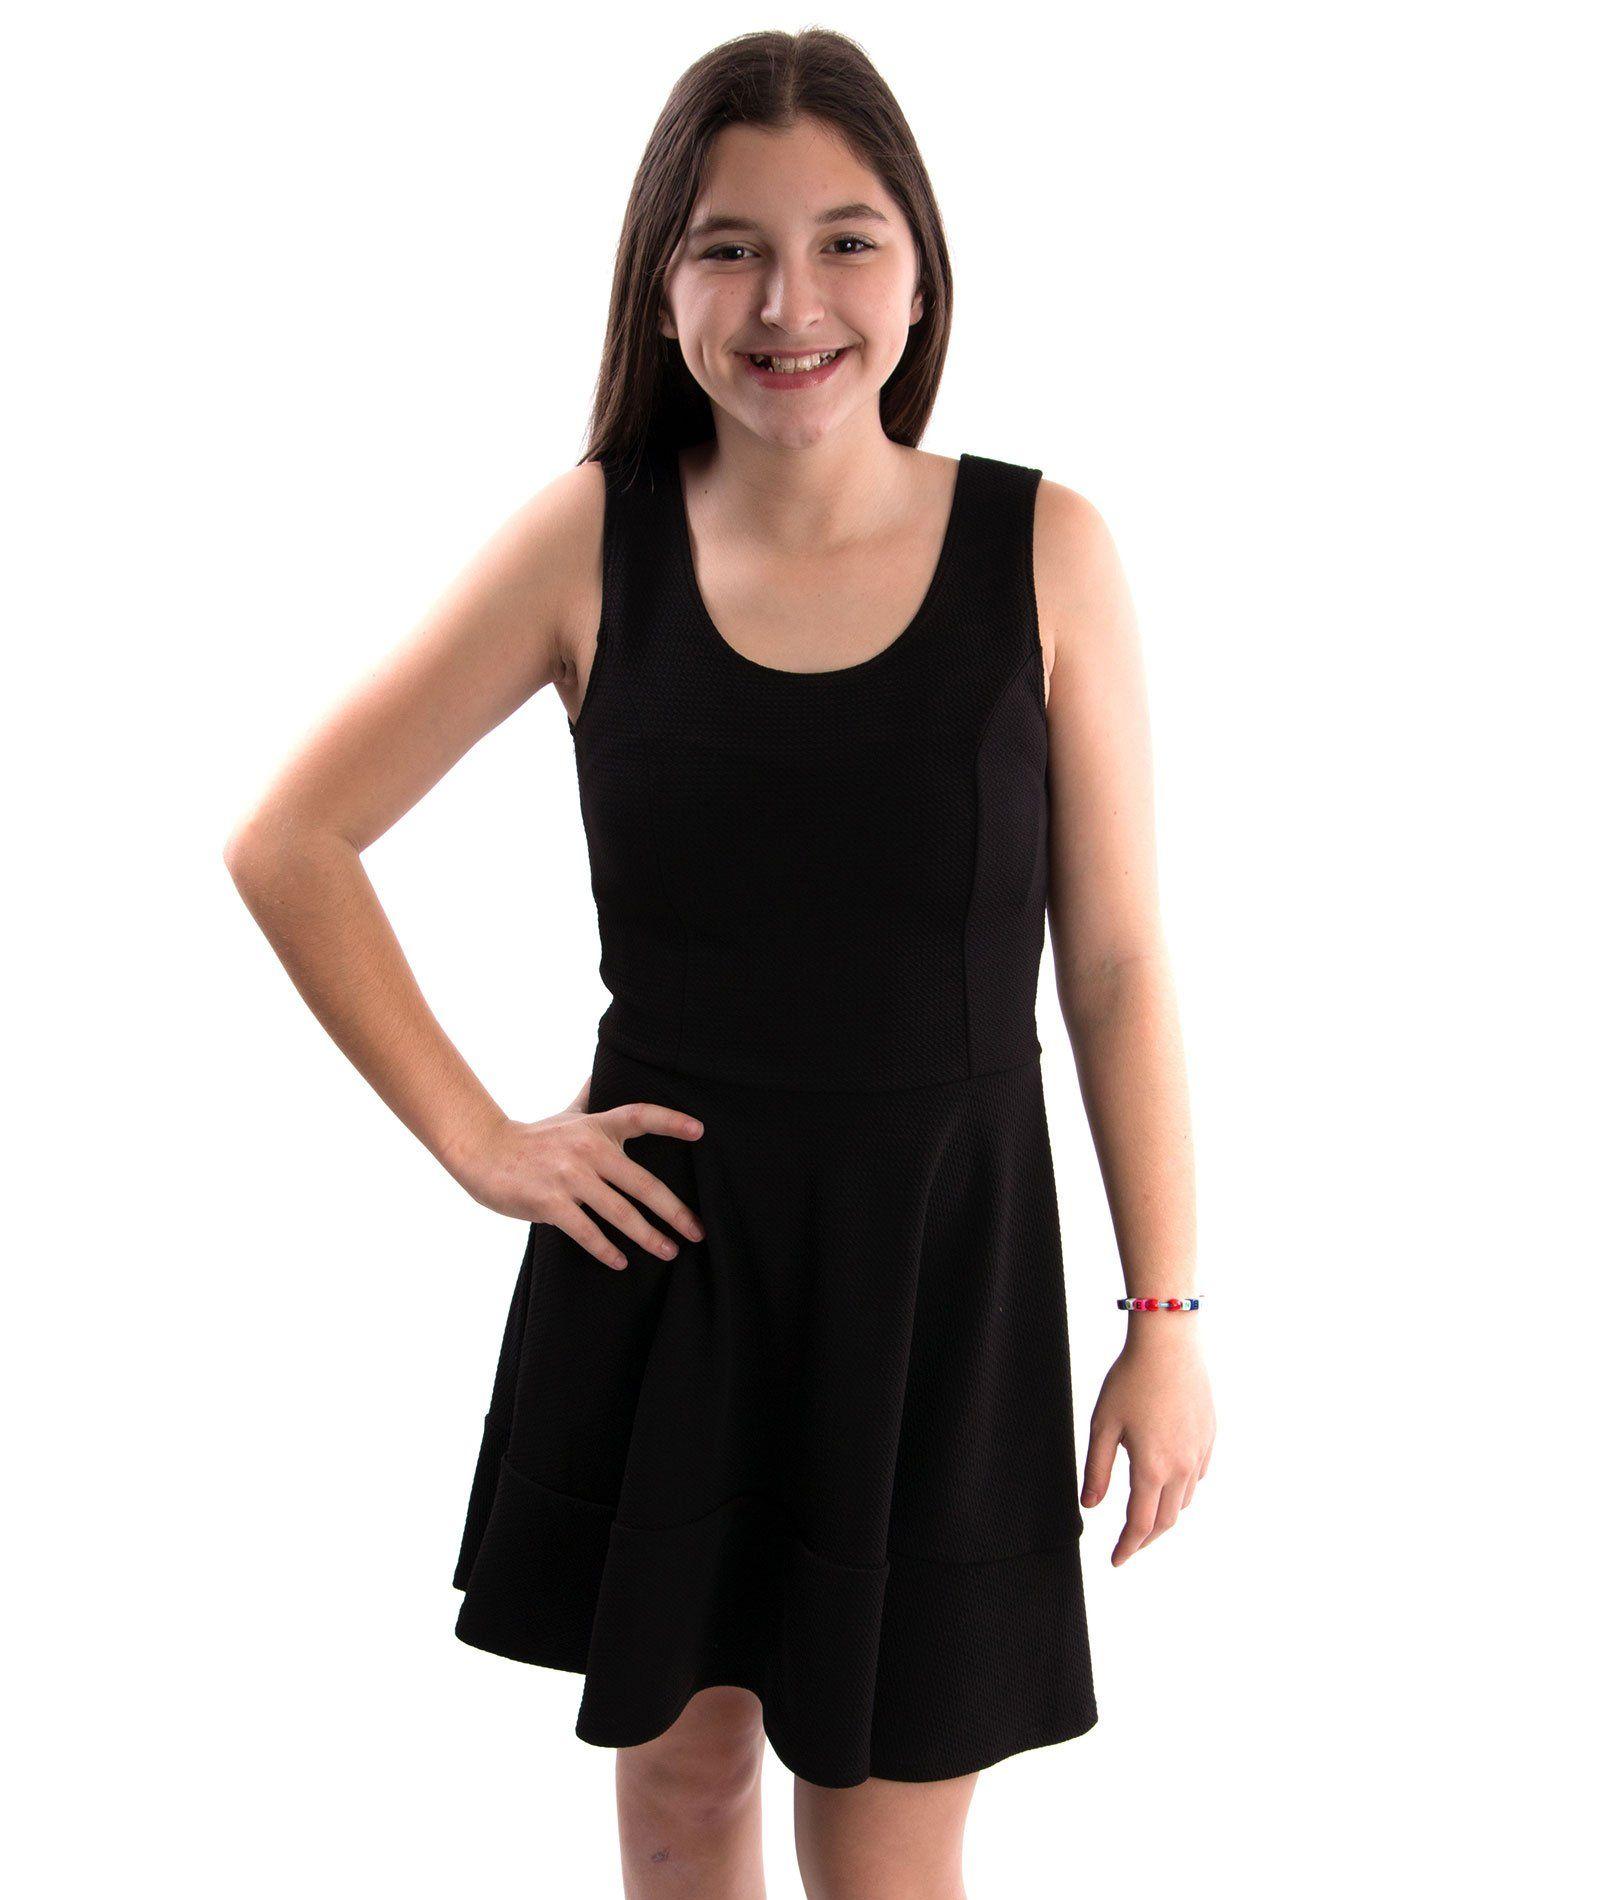 5bf661008 Cheryl Creations Juniors Zip-Back Dress | Products | Dress backs ...